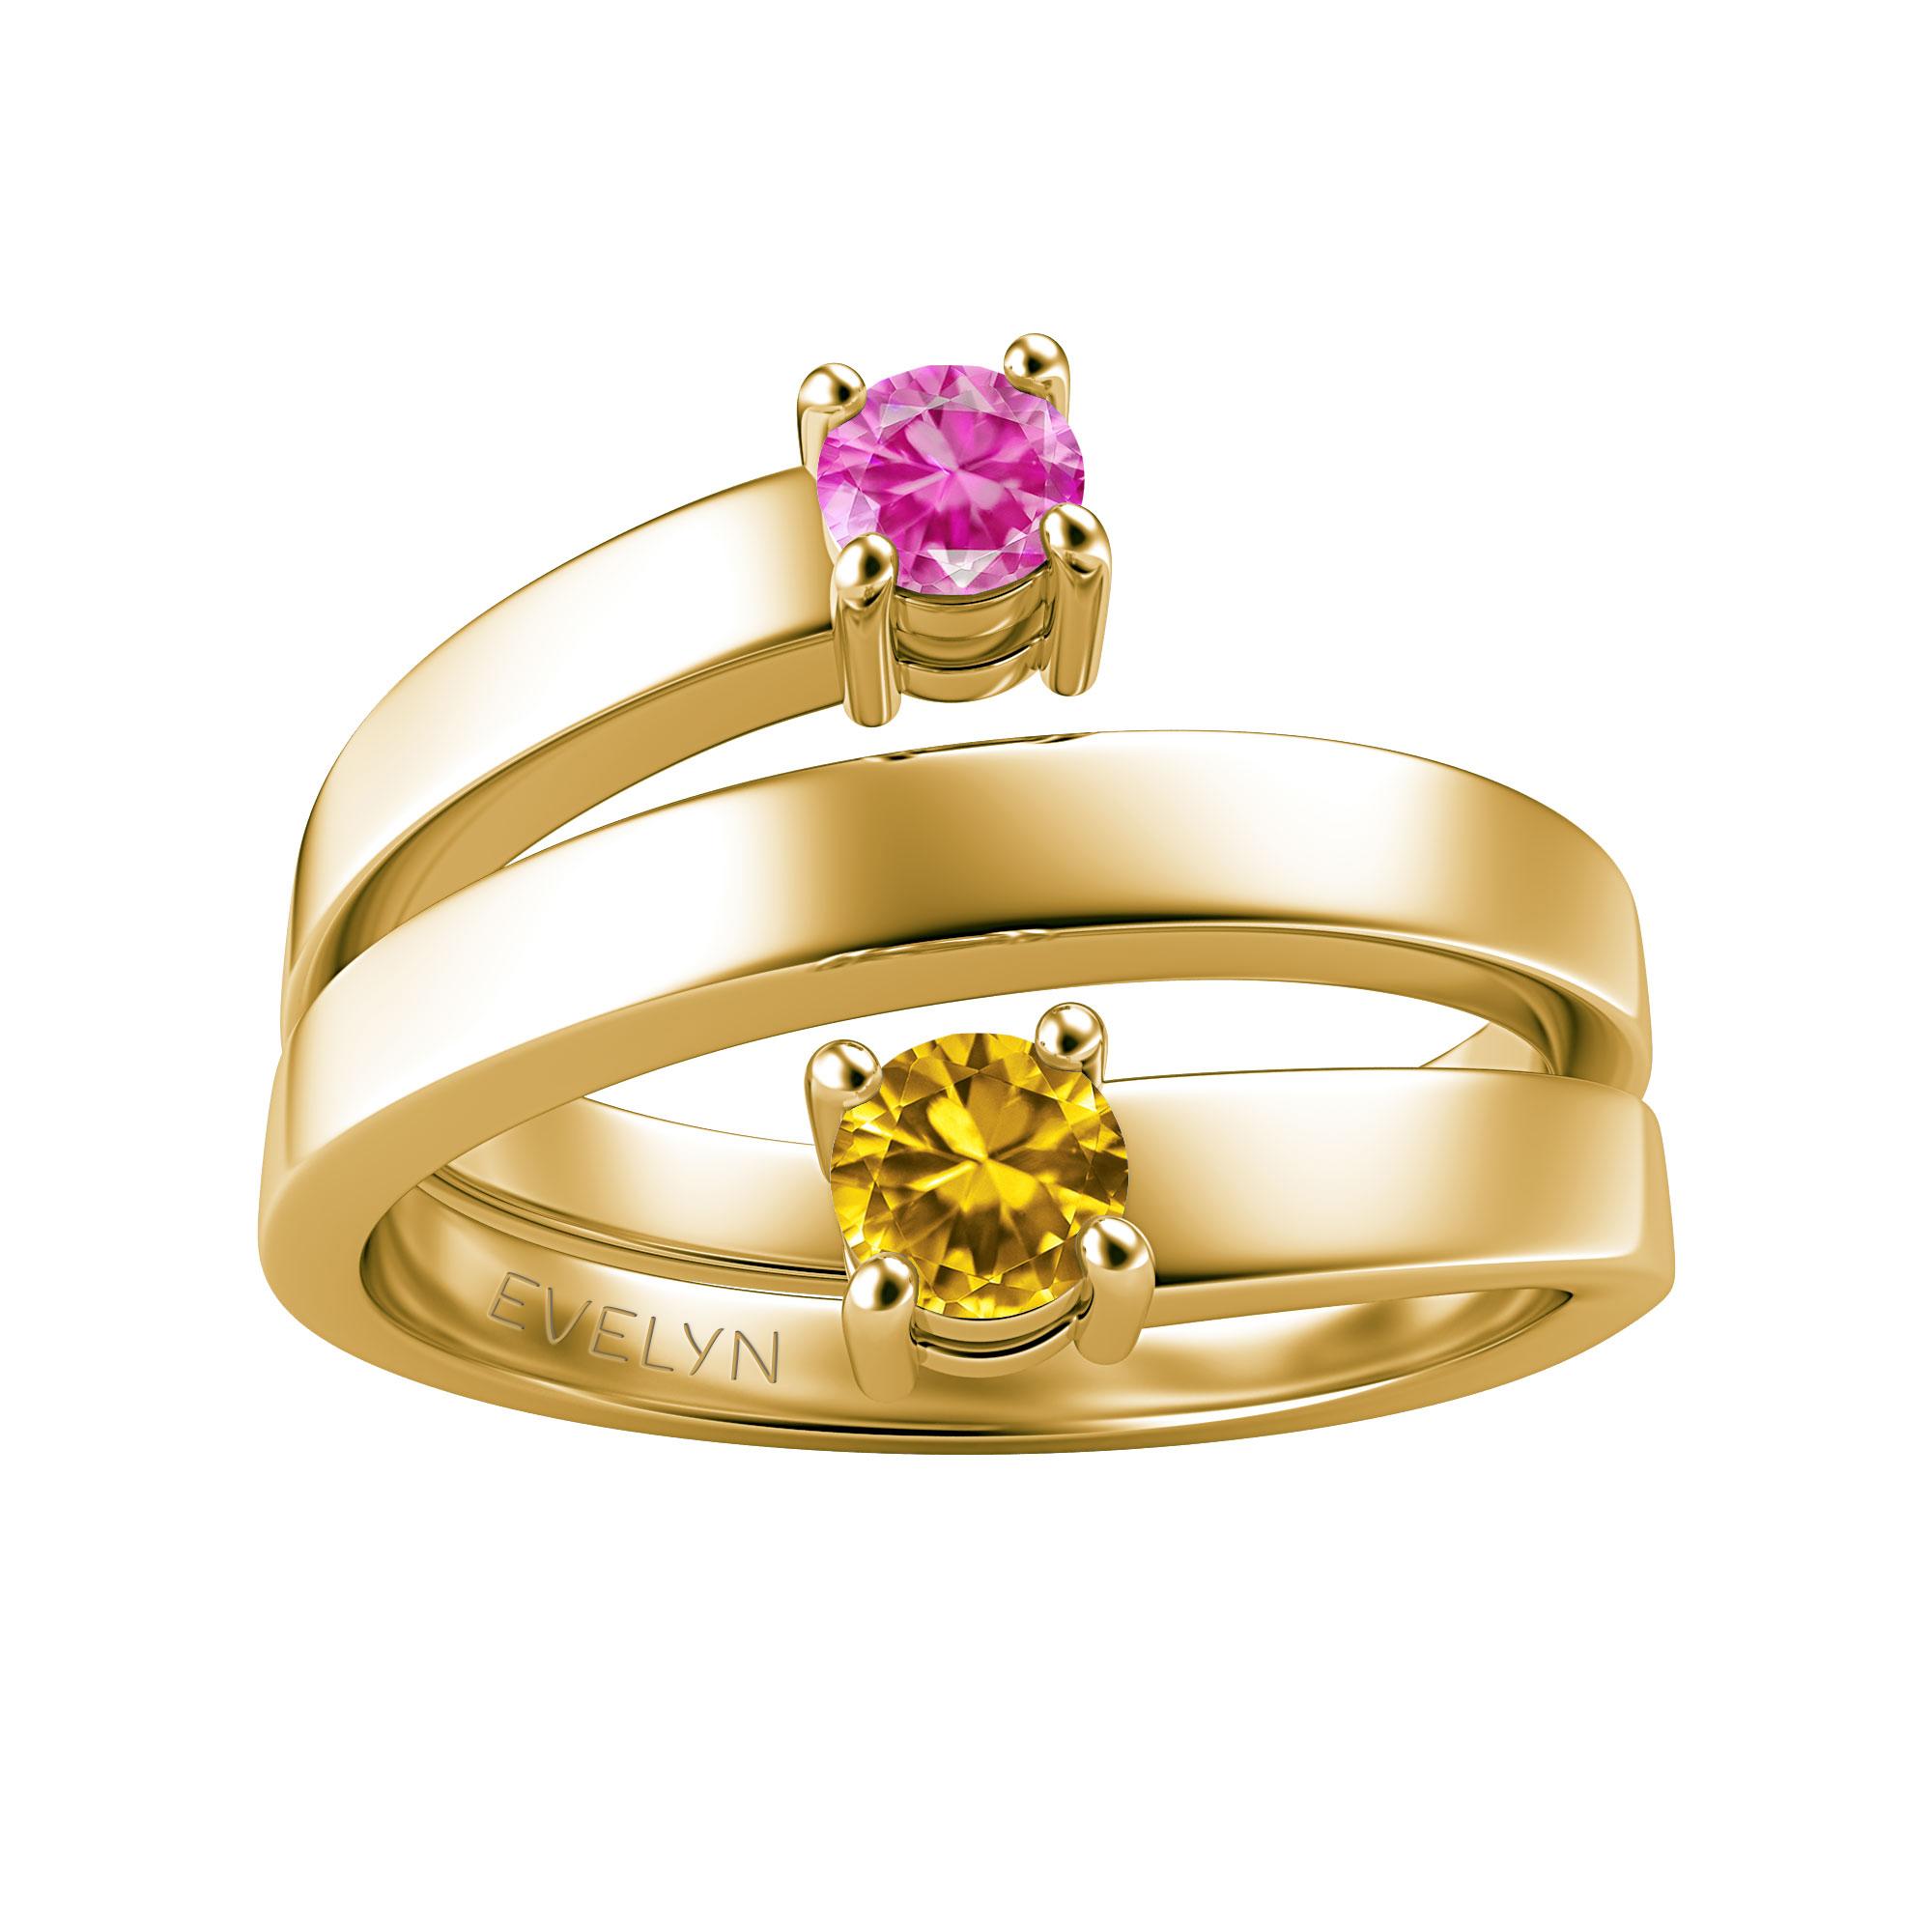 Couple's Custom Birthstone Engravable Coil Ring